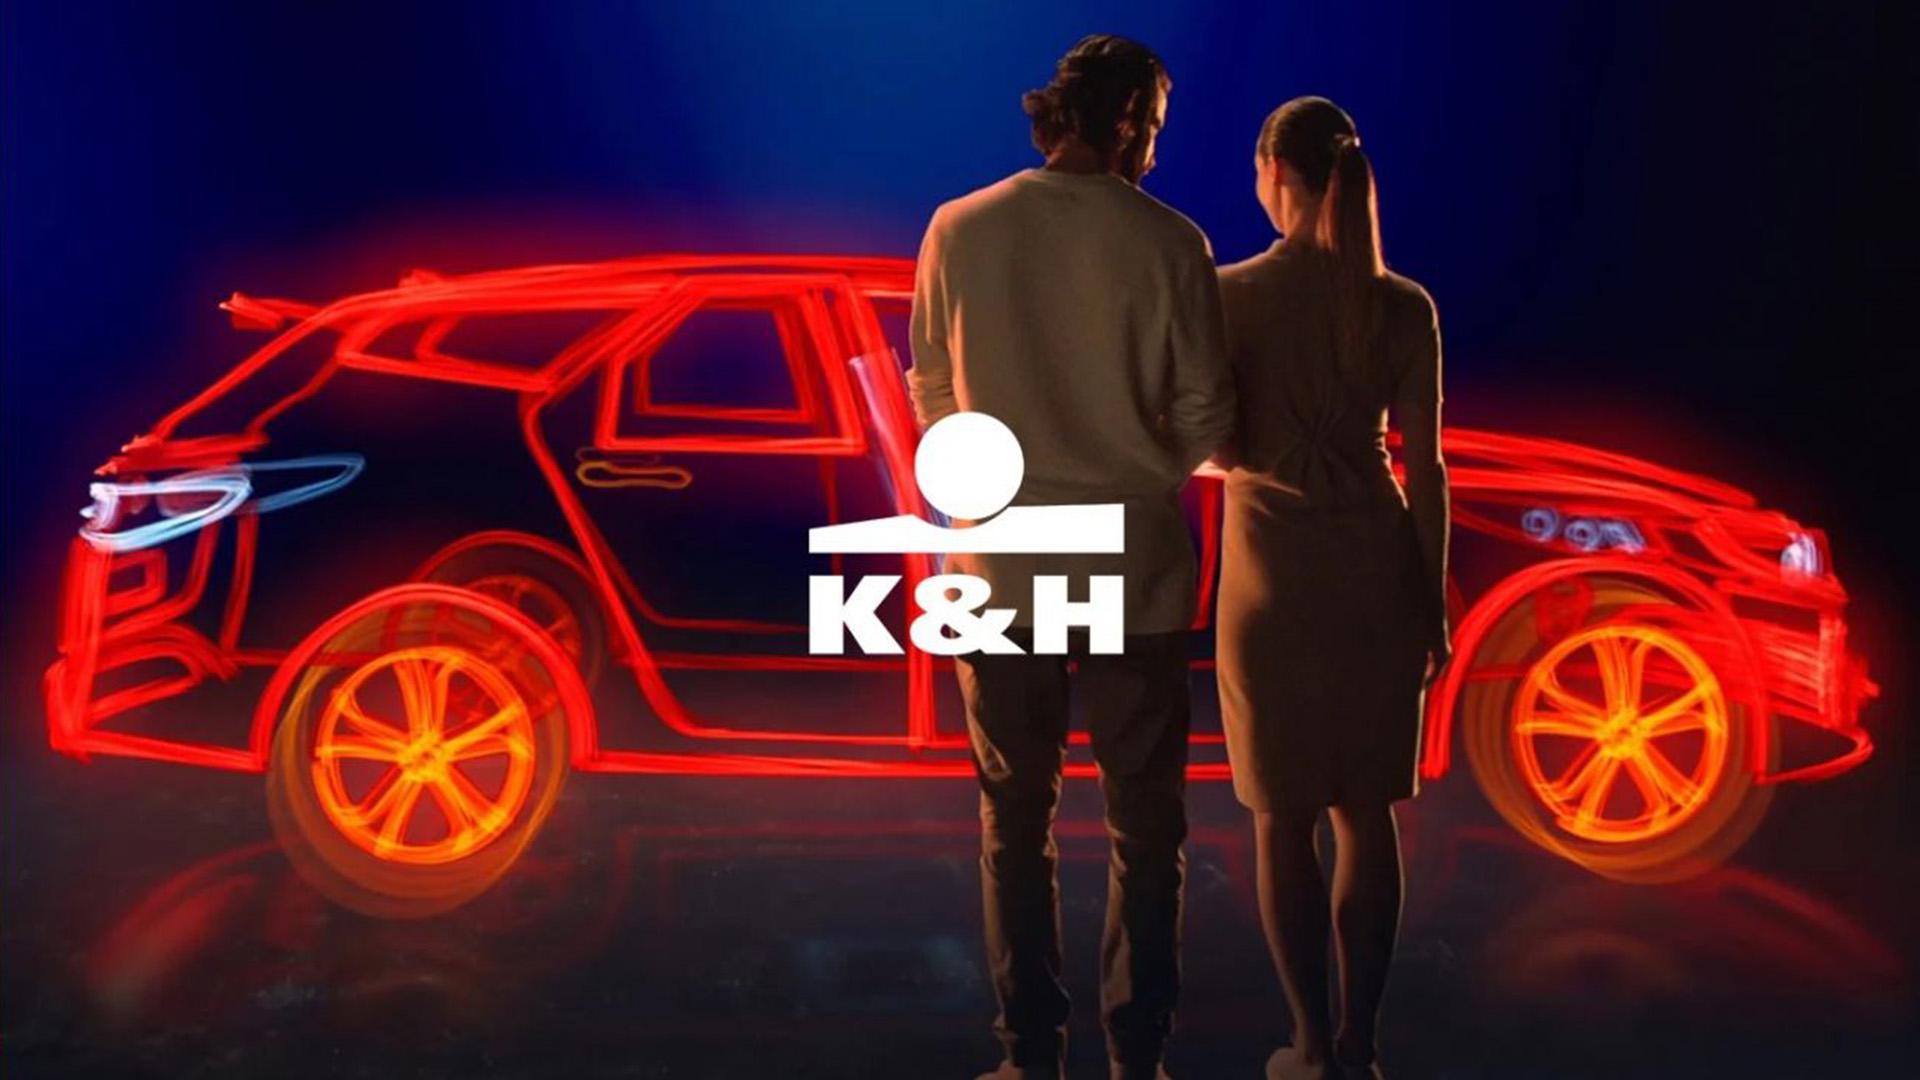 K&H BANK video 01